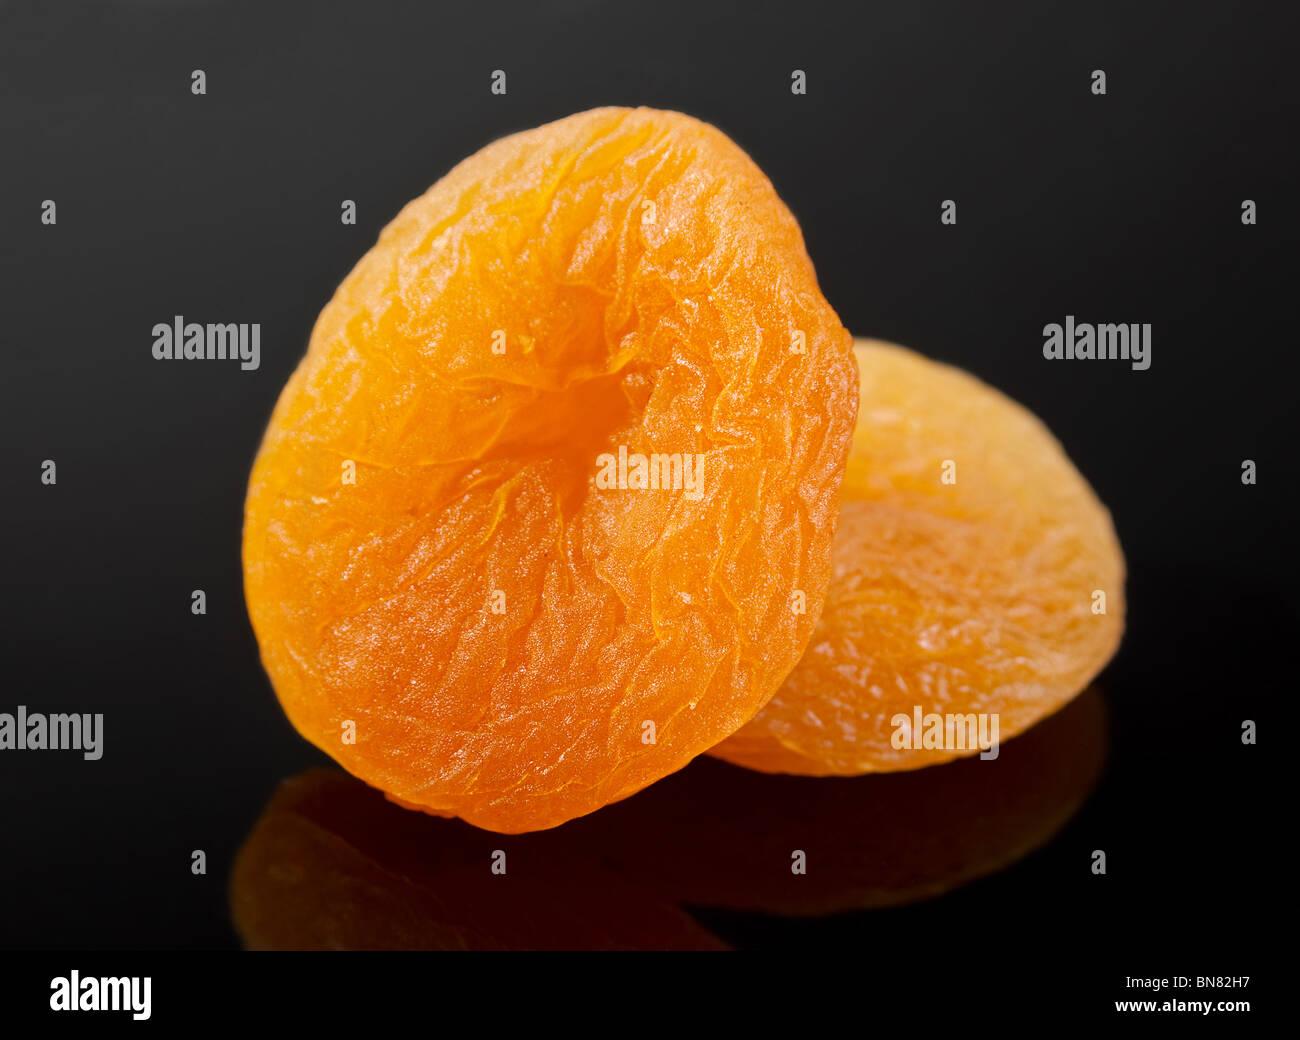 Yellow dried fruit apricot closeup on black - Stock Image